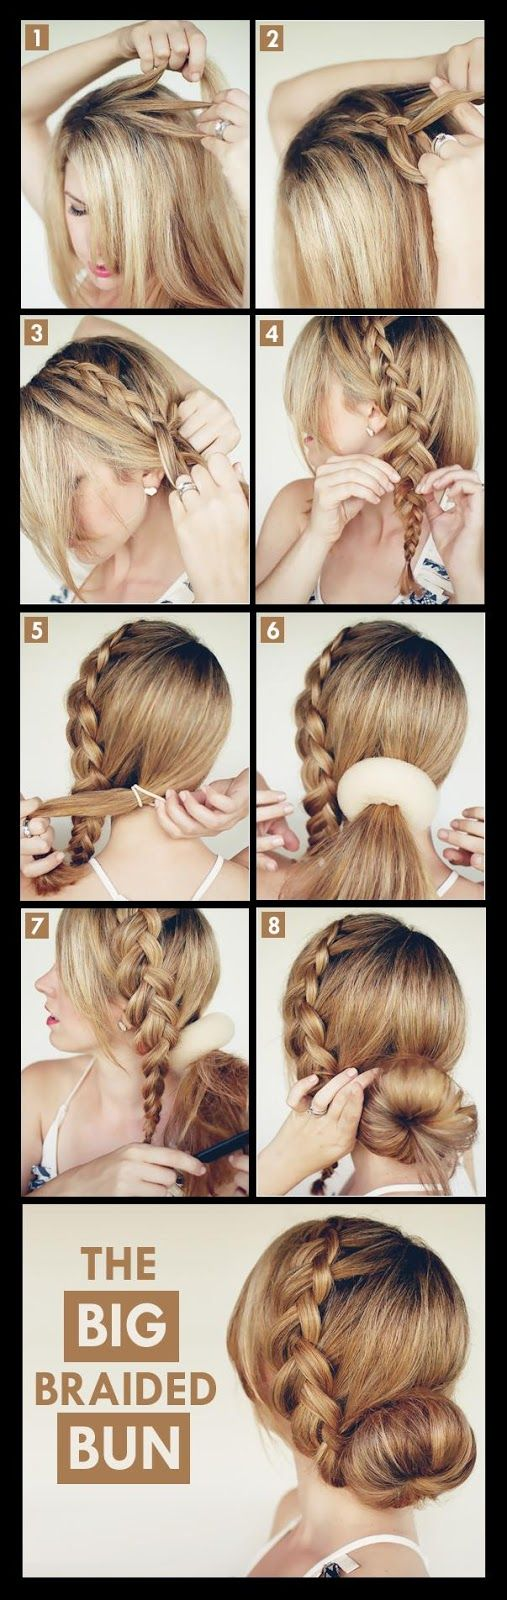 Make a big braided bun for your self hairstyles tutorial hair